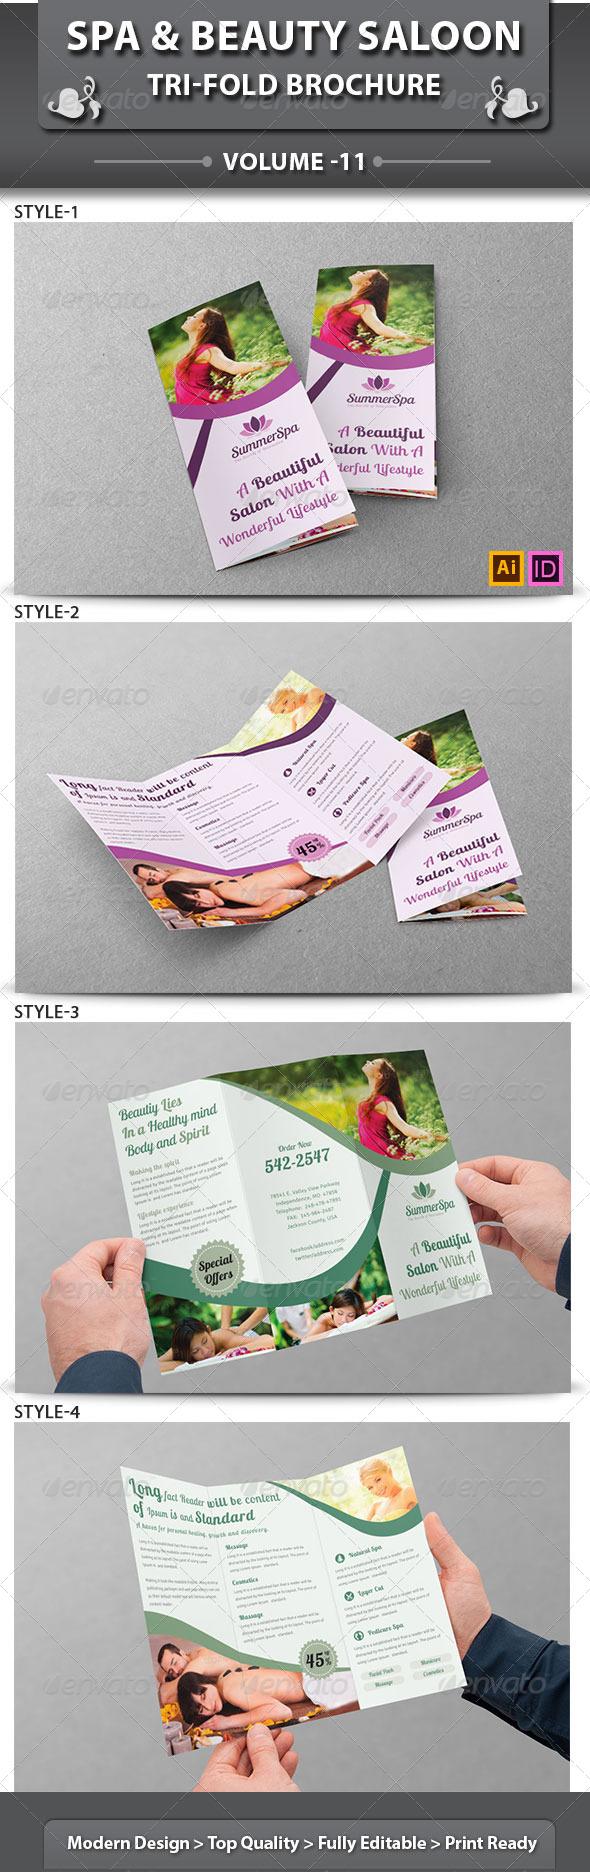 Spa & Beauty Saloon Tri-Fold Brochure | Volume 11 - Brochures Print Templates